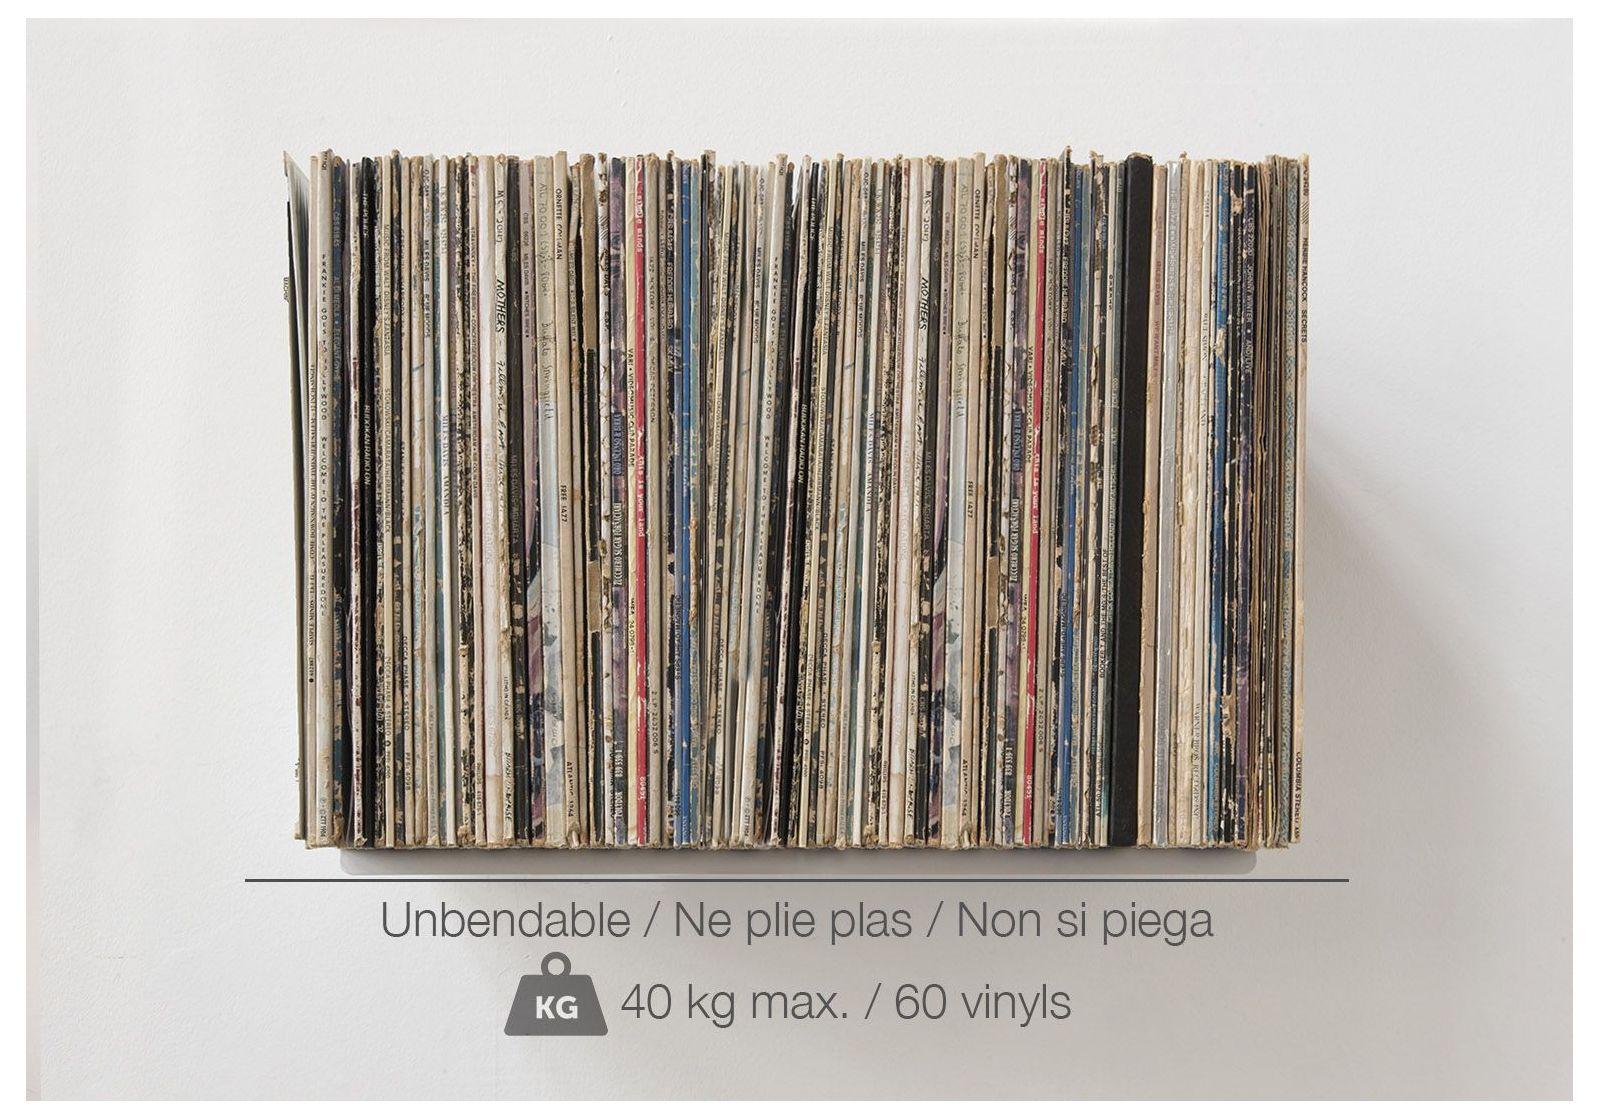 schallplattenregal ubd set aus 2 regalen 60 70. Black Bedroom Furniture Sets. Home Design Ideas